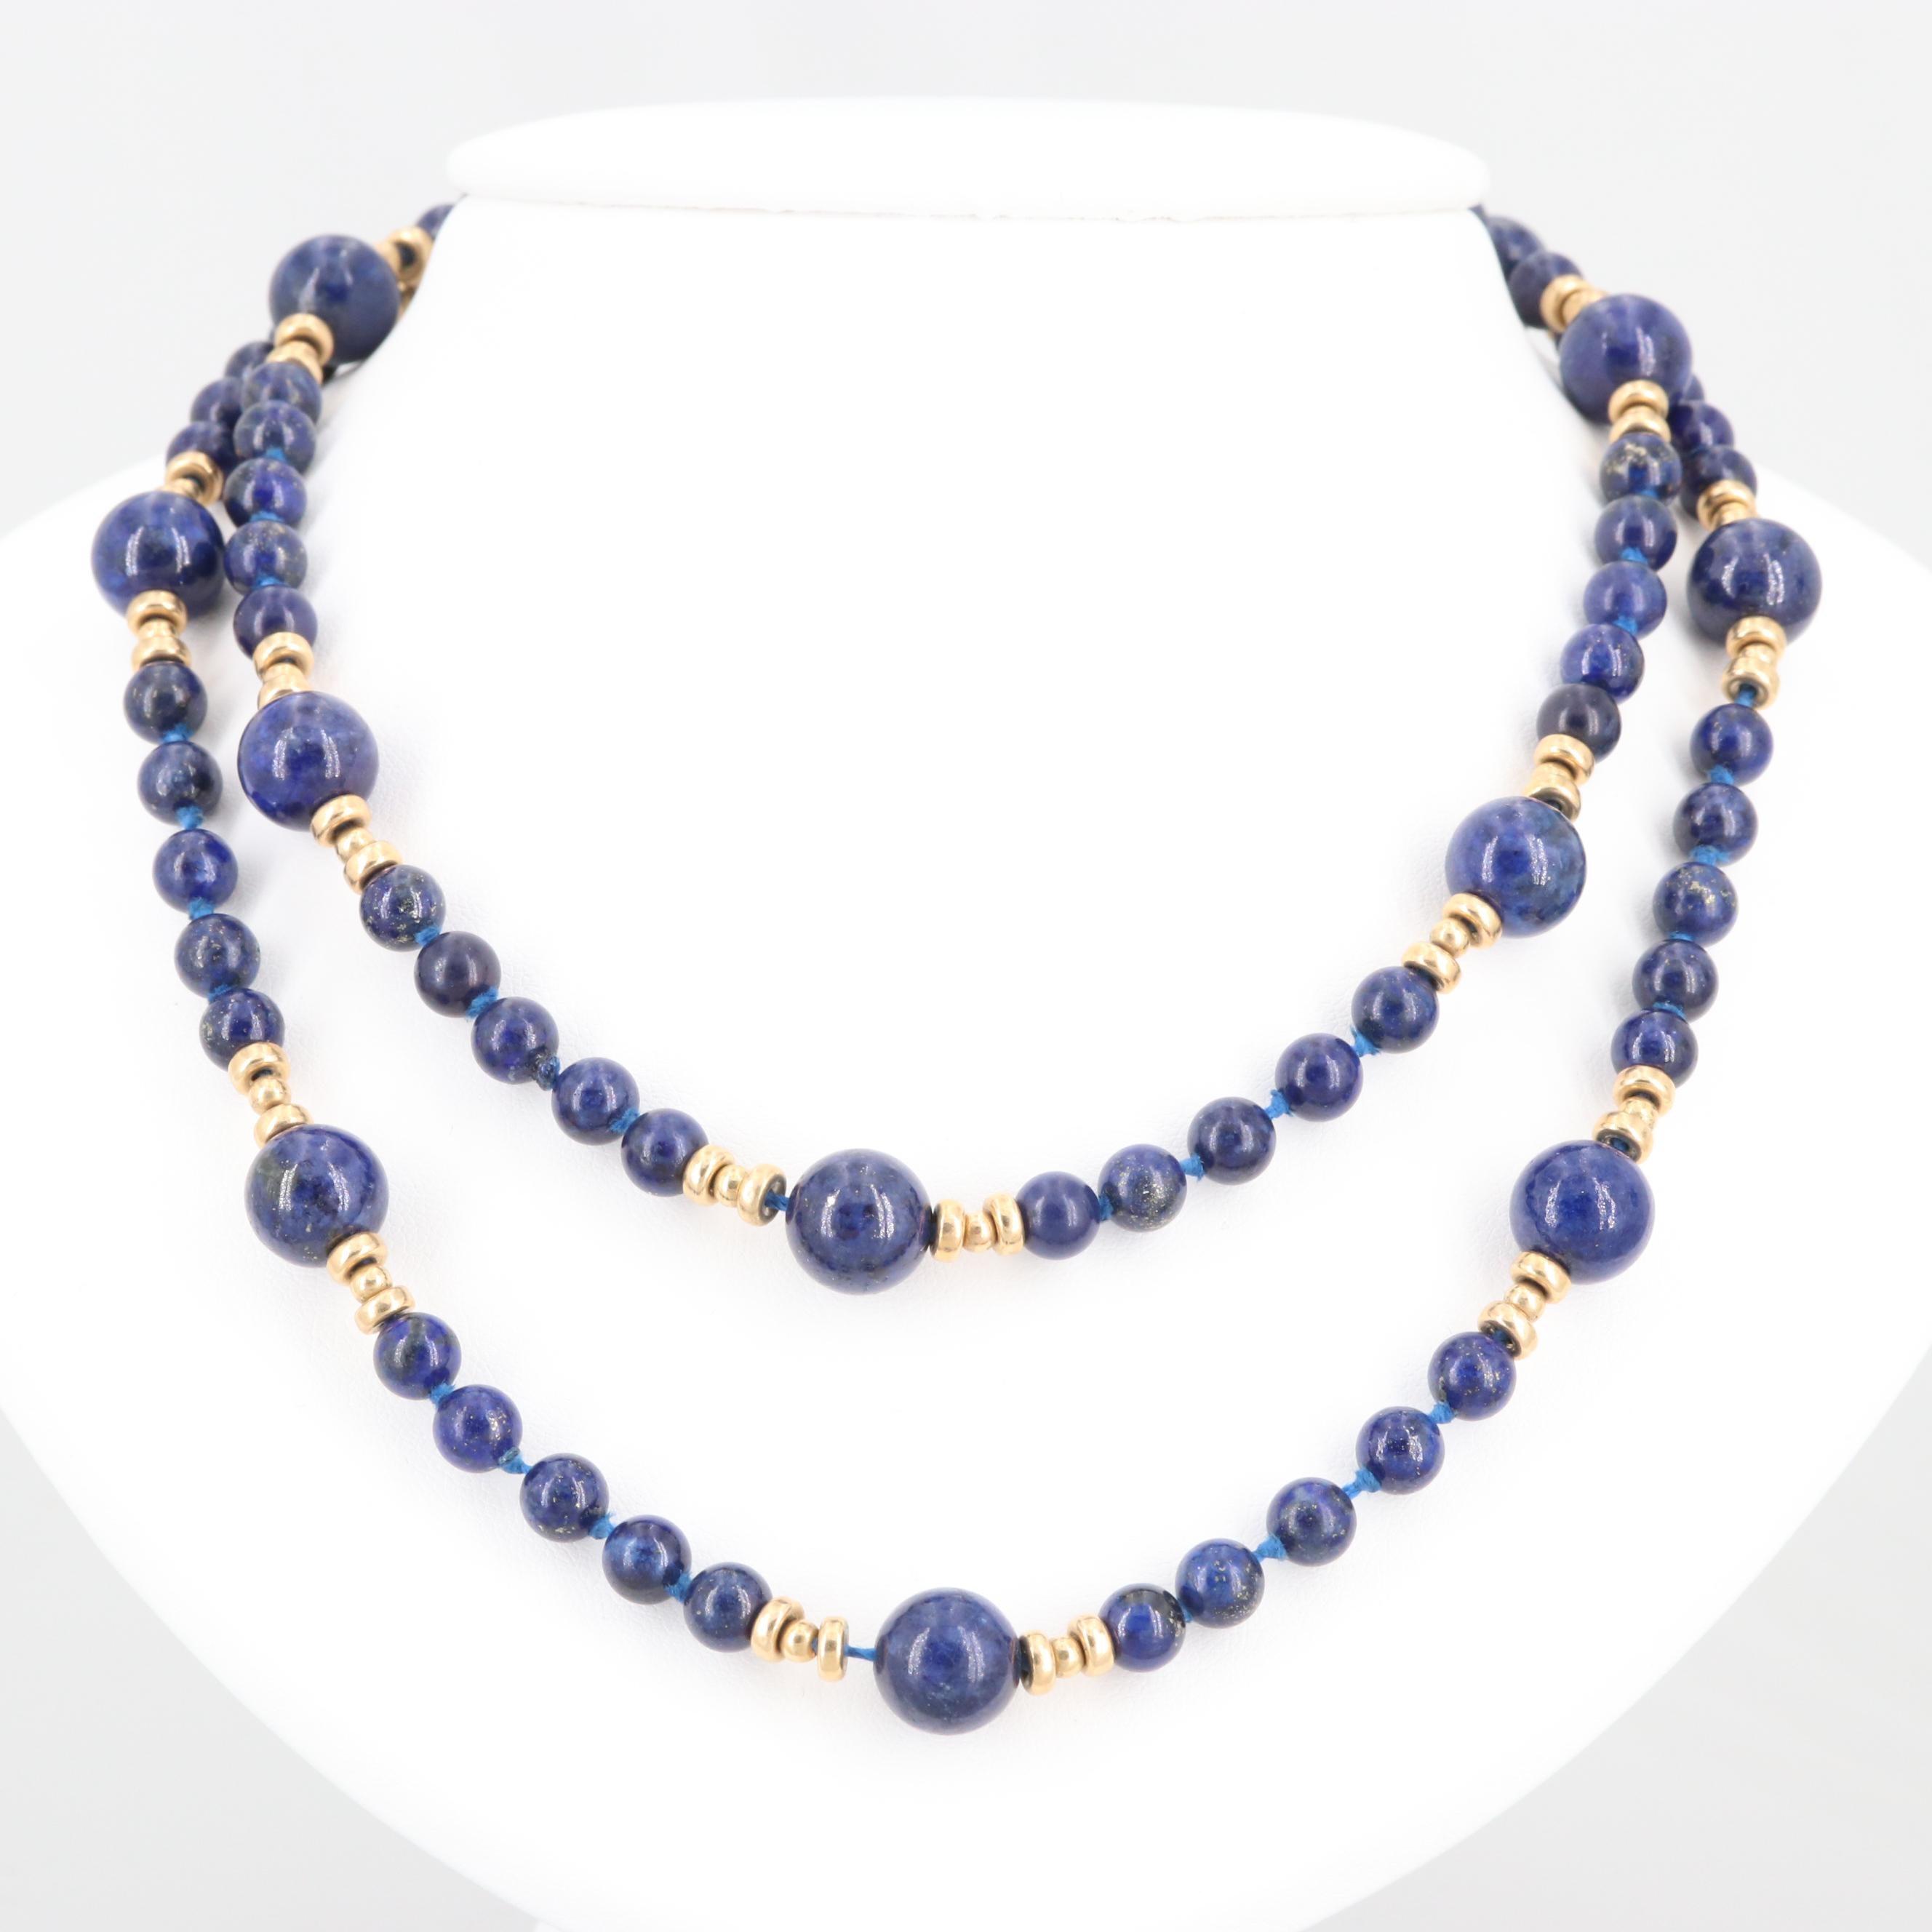 14K Yellow Gold Lapis Lazuli Endless Necklace